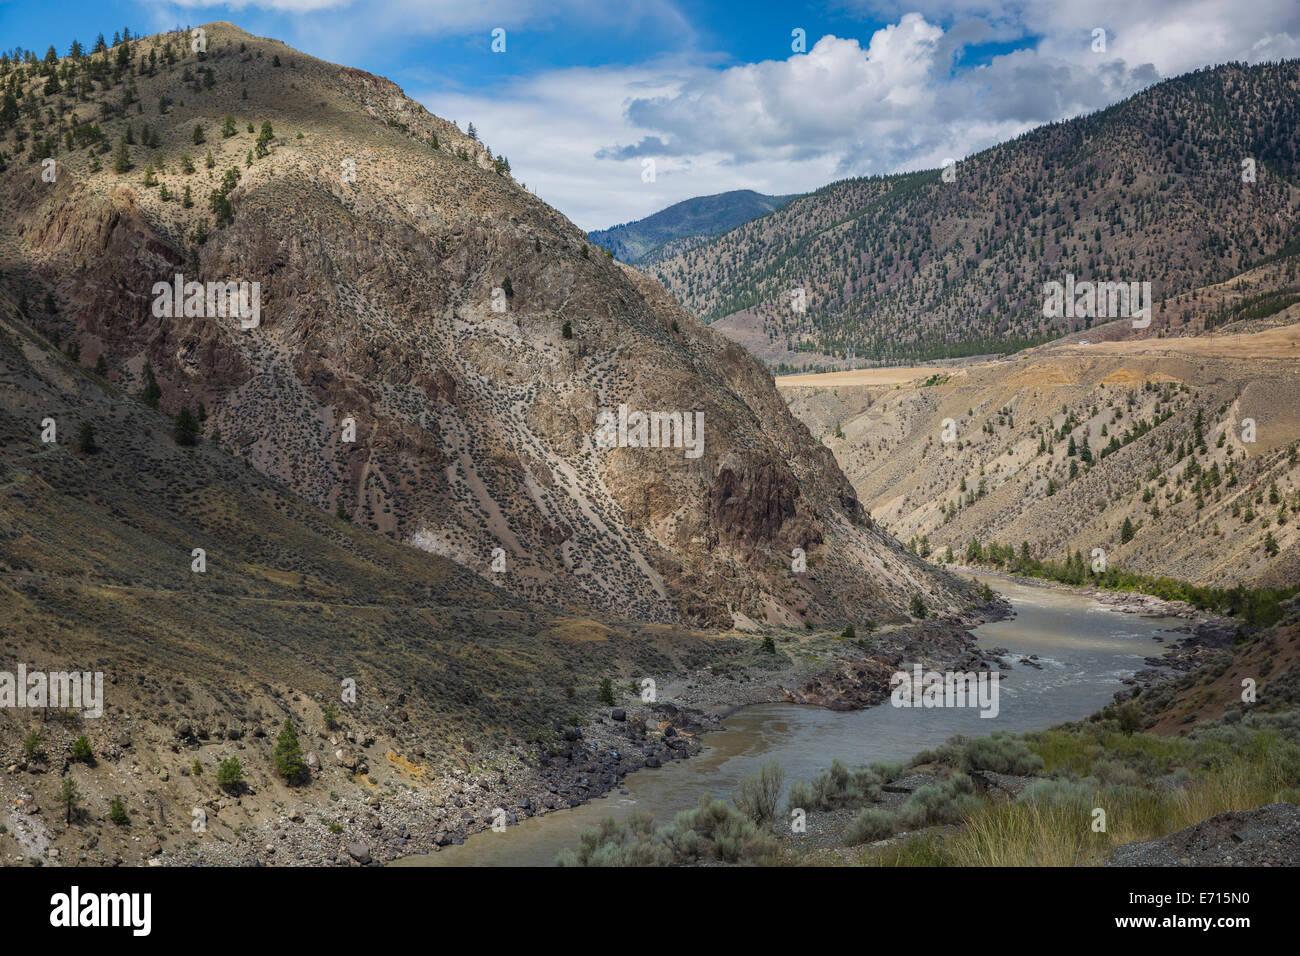 Canada, British Columbia, Summer at Cache creek - Stock Image